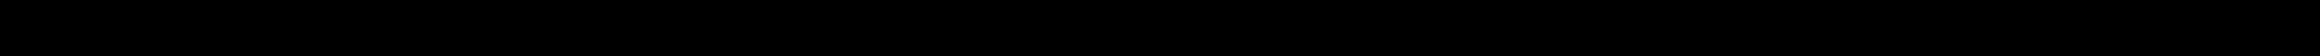 SKF 90080-36193, 90369-45003, GP9A-33-047A, GP9A-33-047C, GP9A-33-047D Zestaw łożysk koła